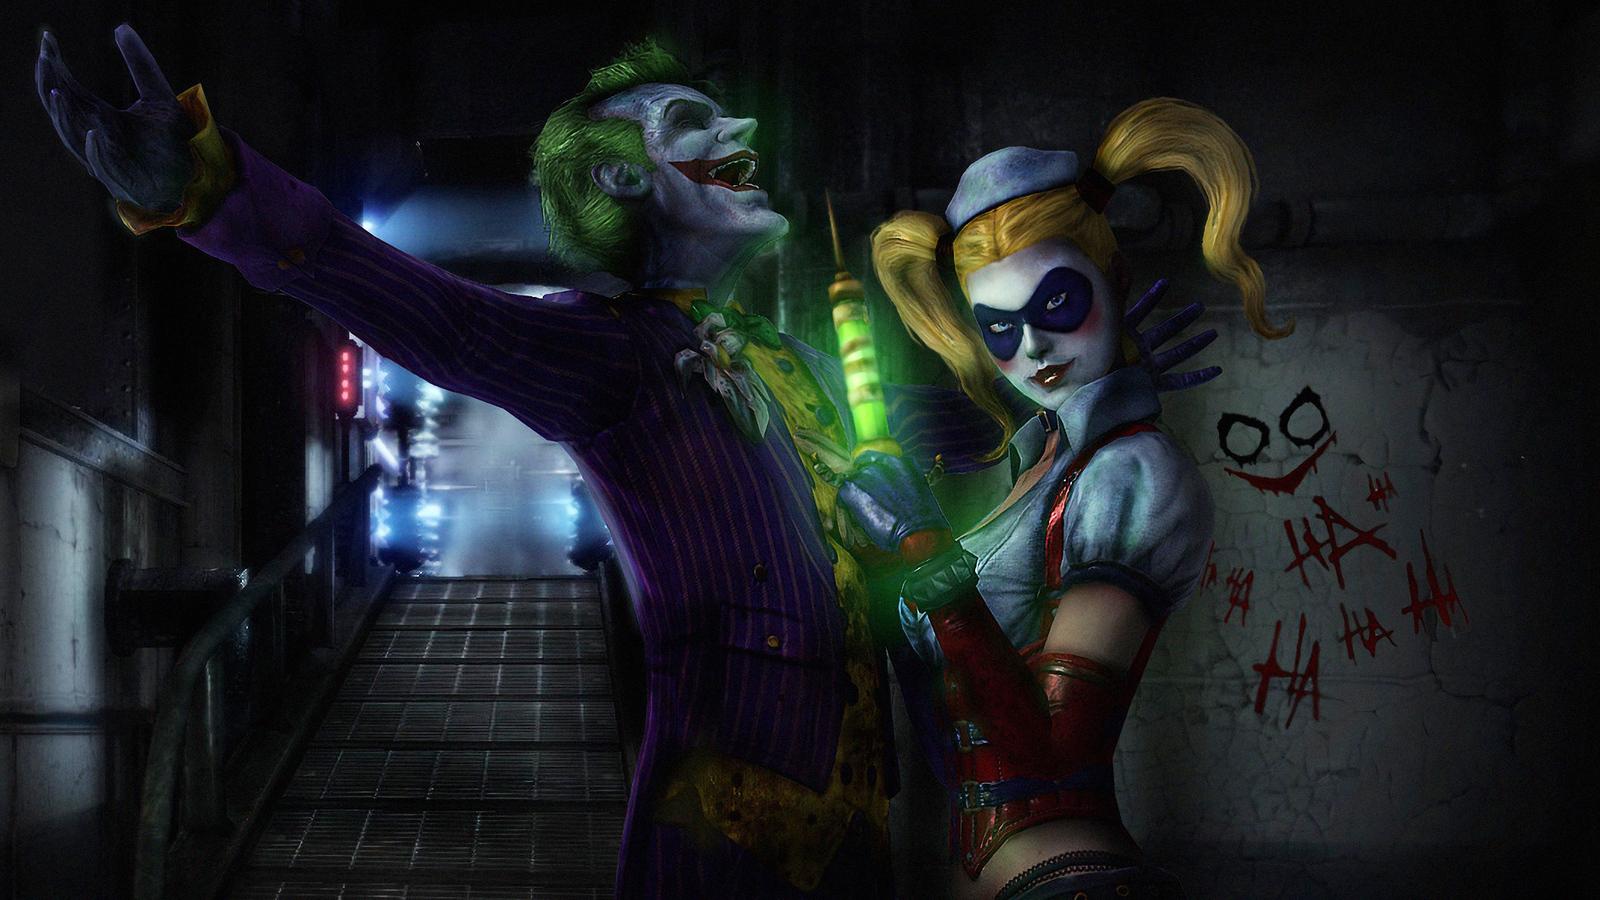 1600x900 Joker Harley Quinn Laughing 1600x900 Resolution Hd